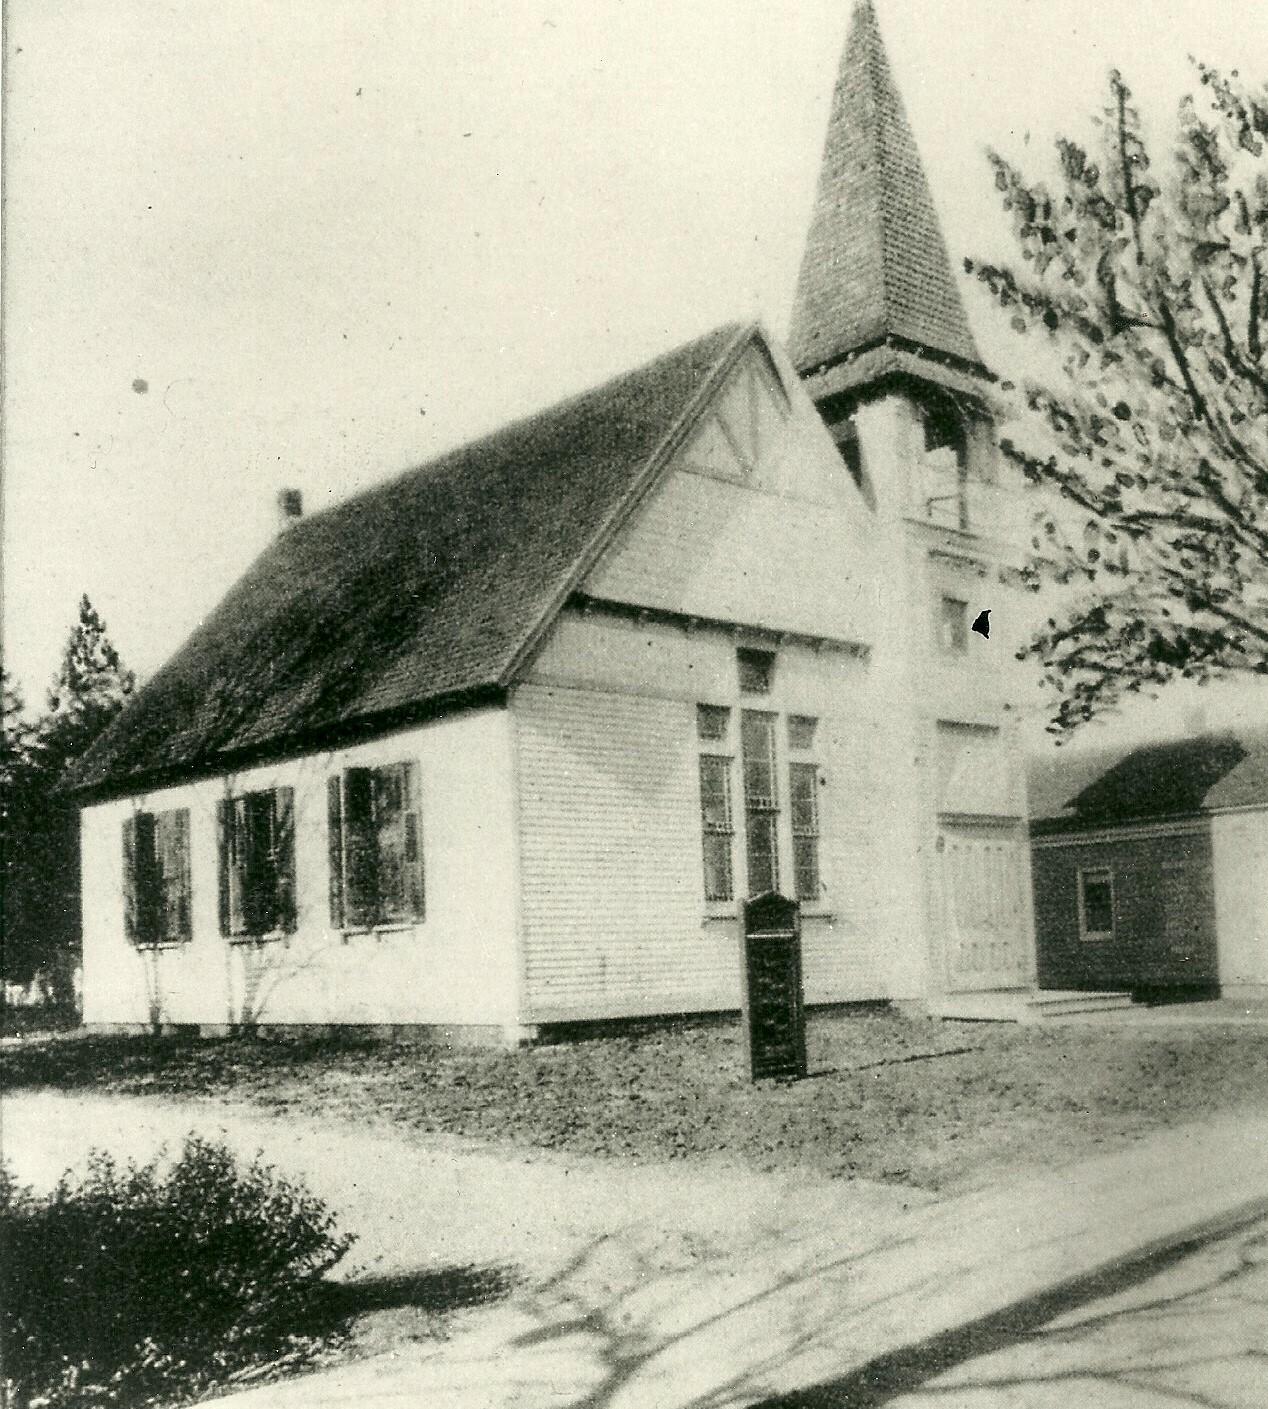 Originally the Methodist Episcopal Church, the circa-1882 building still stands today.